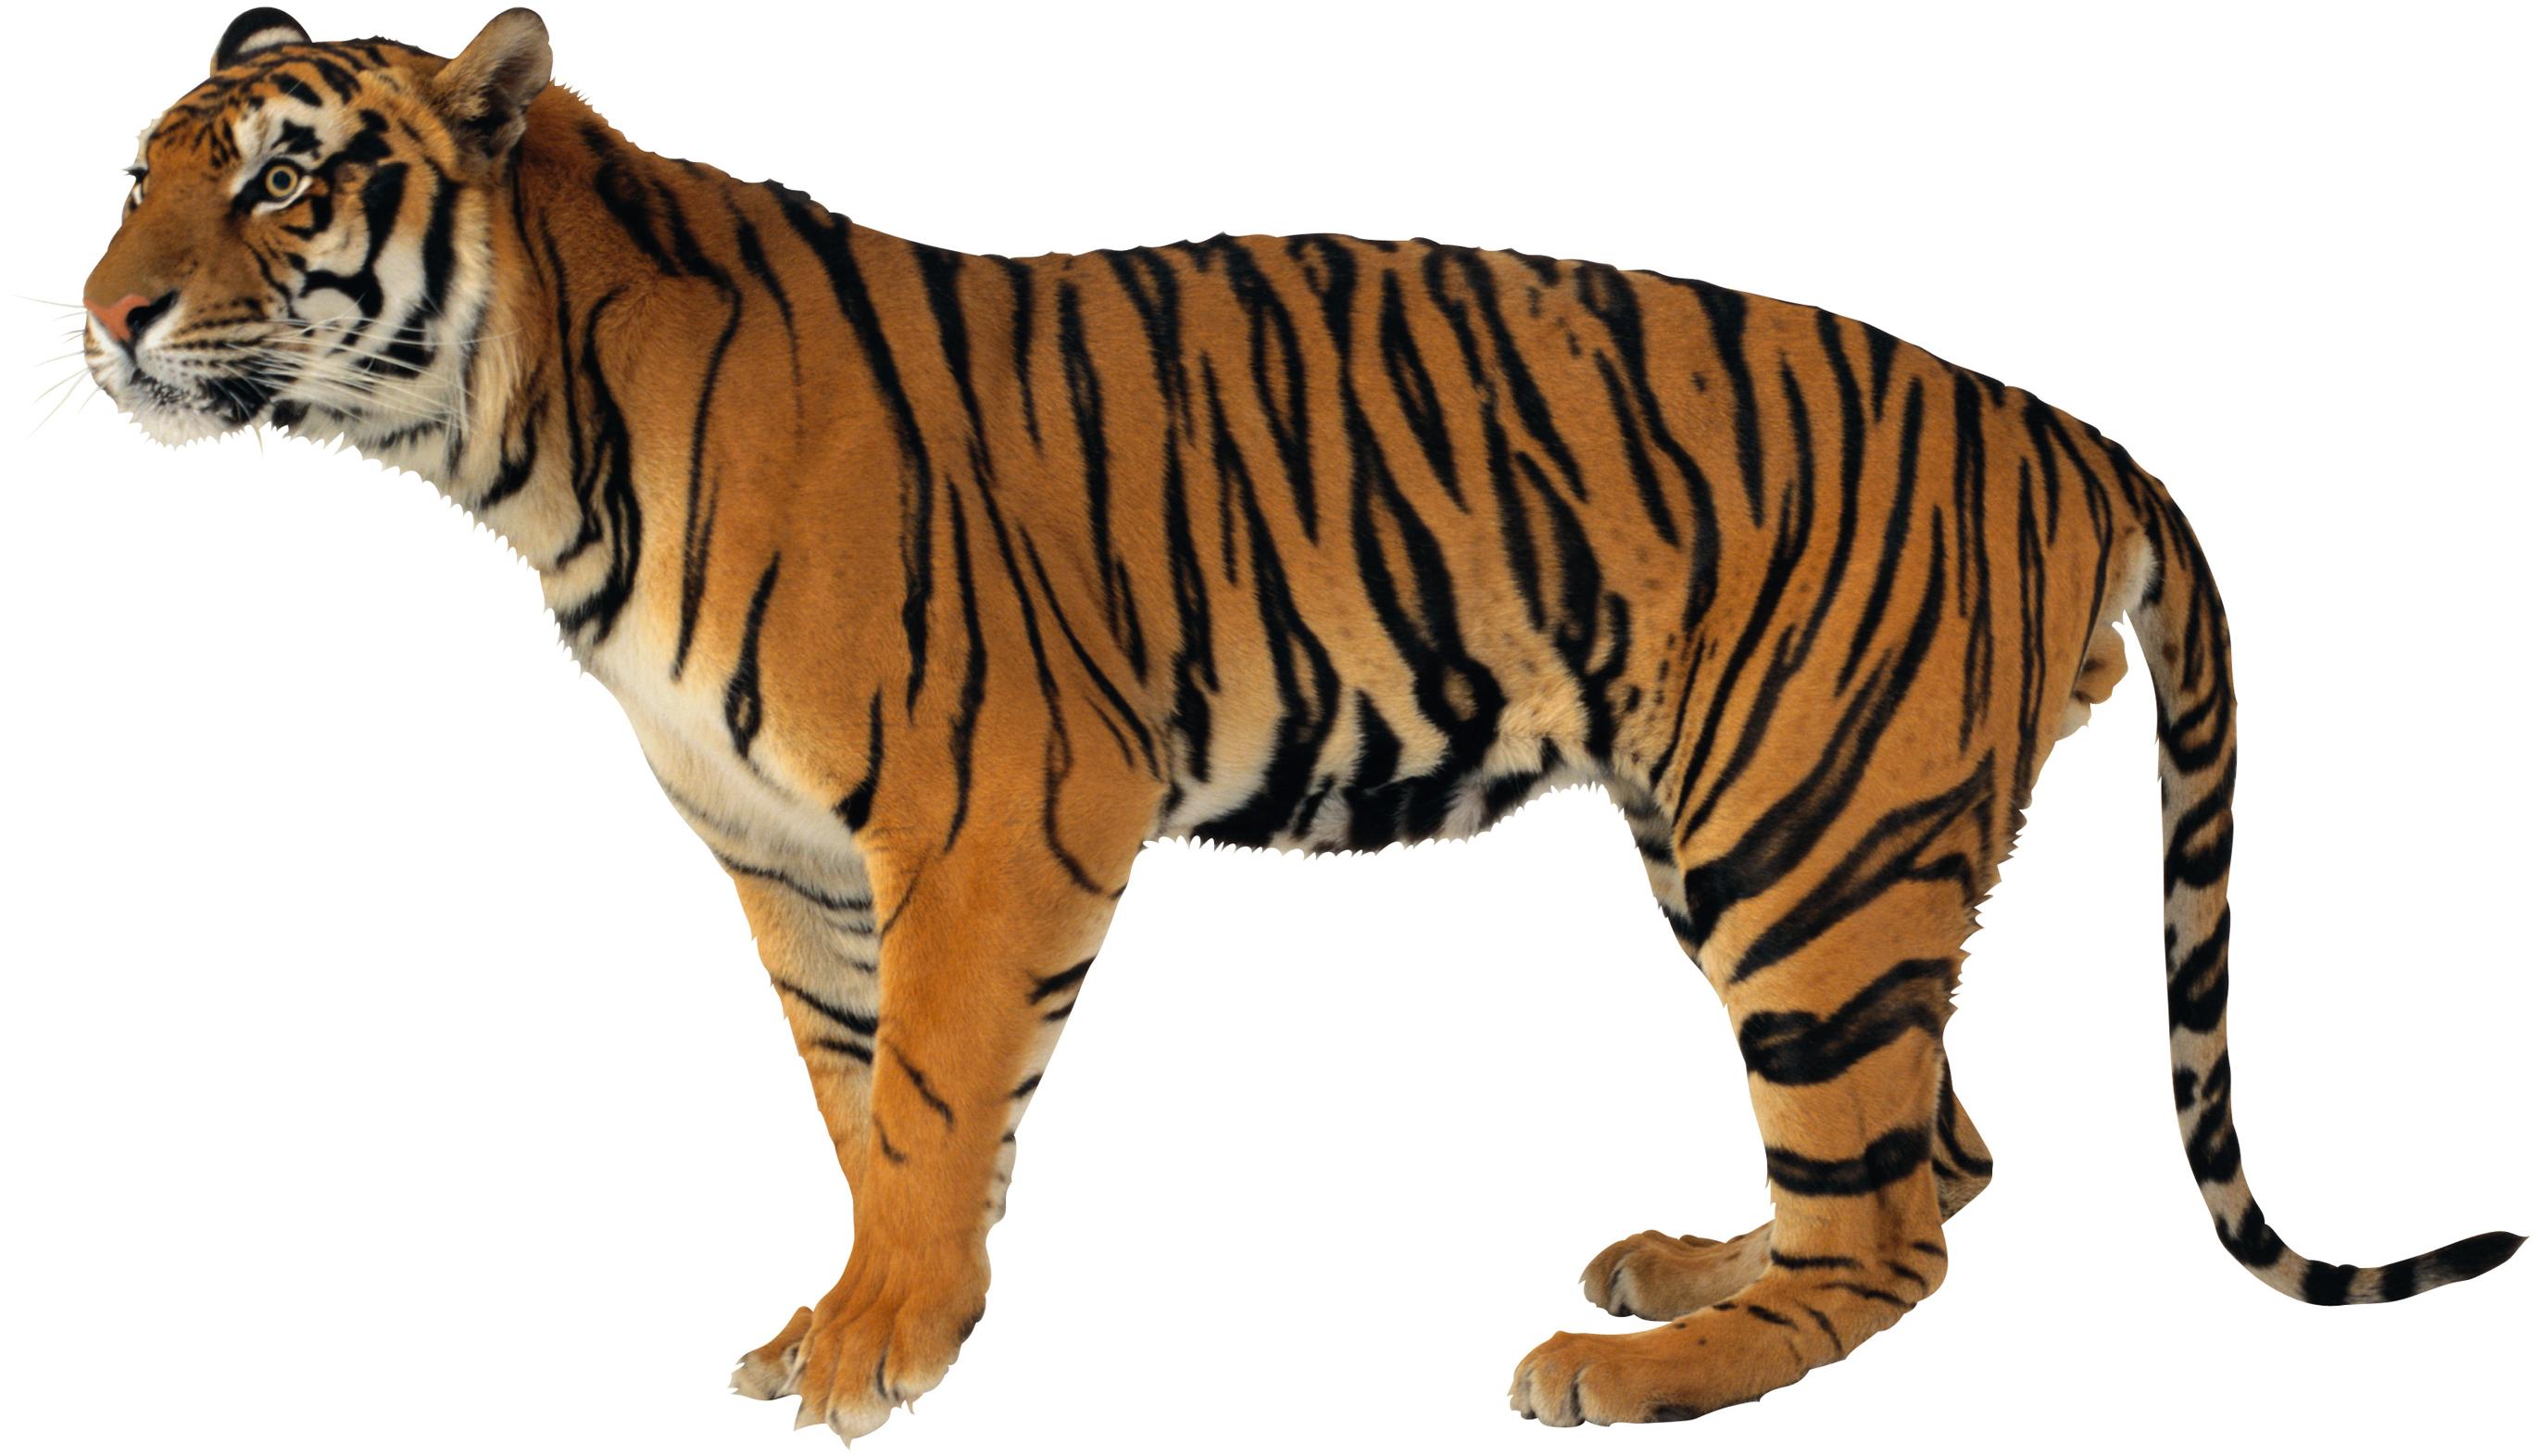 только картинка тигр без фона старых шахматах слон